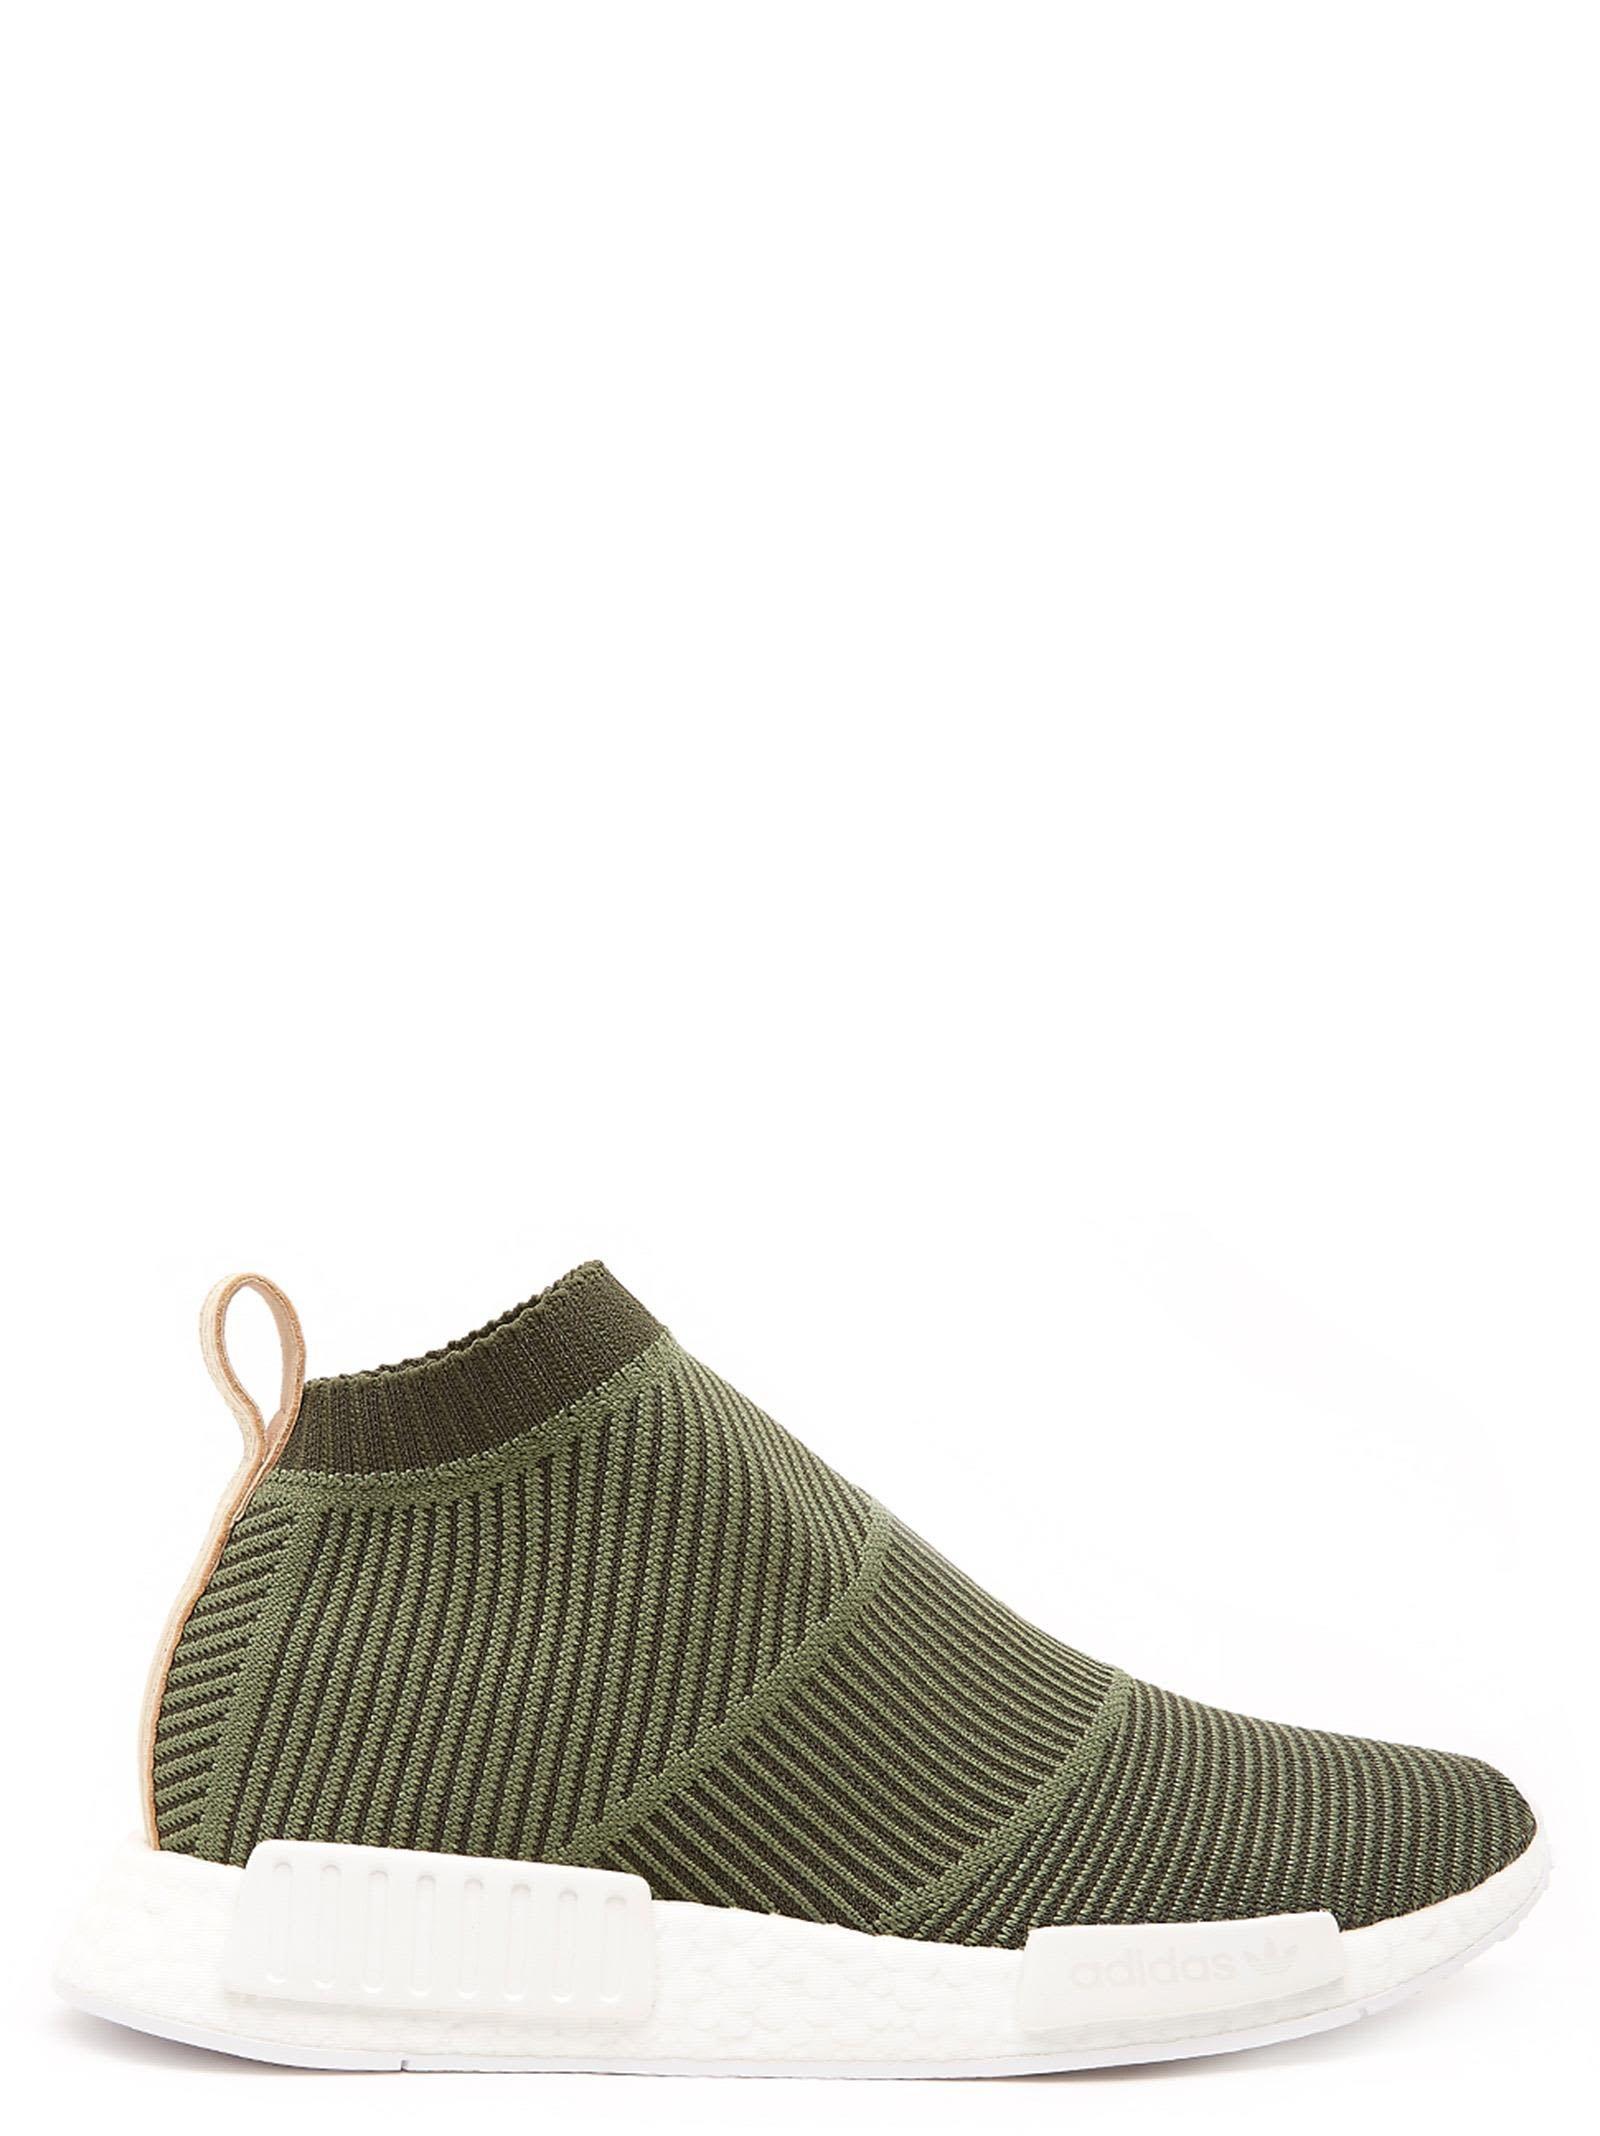 Adidas Men Originals NMD CS1 Primeknit Shoes WhiteSolid